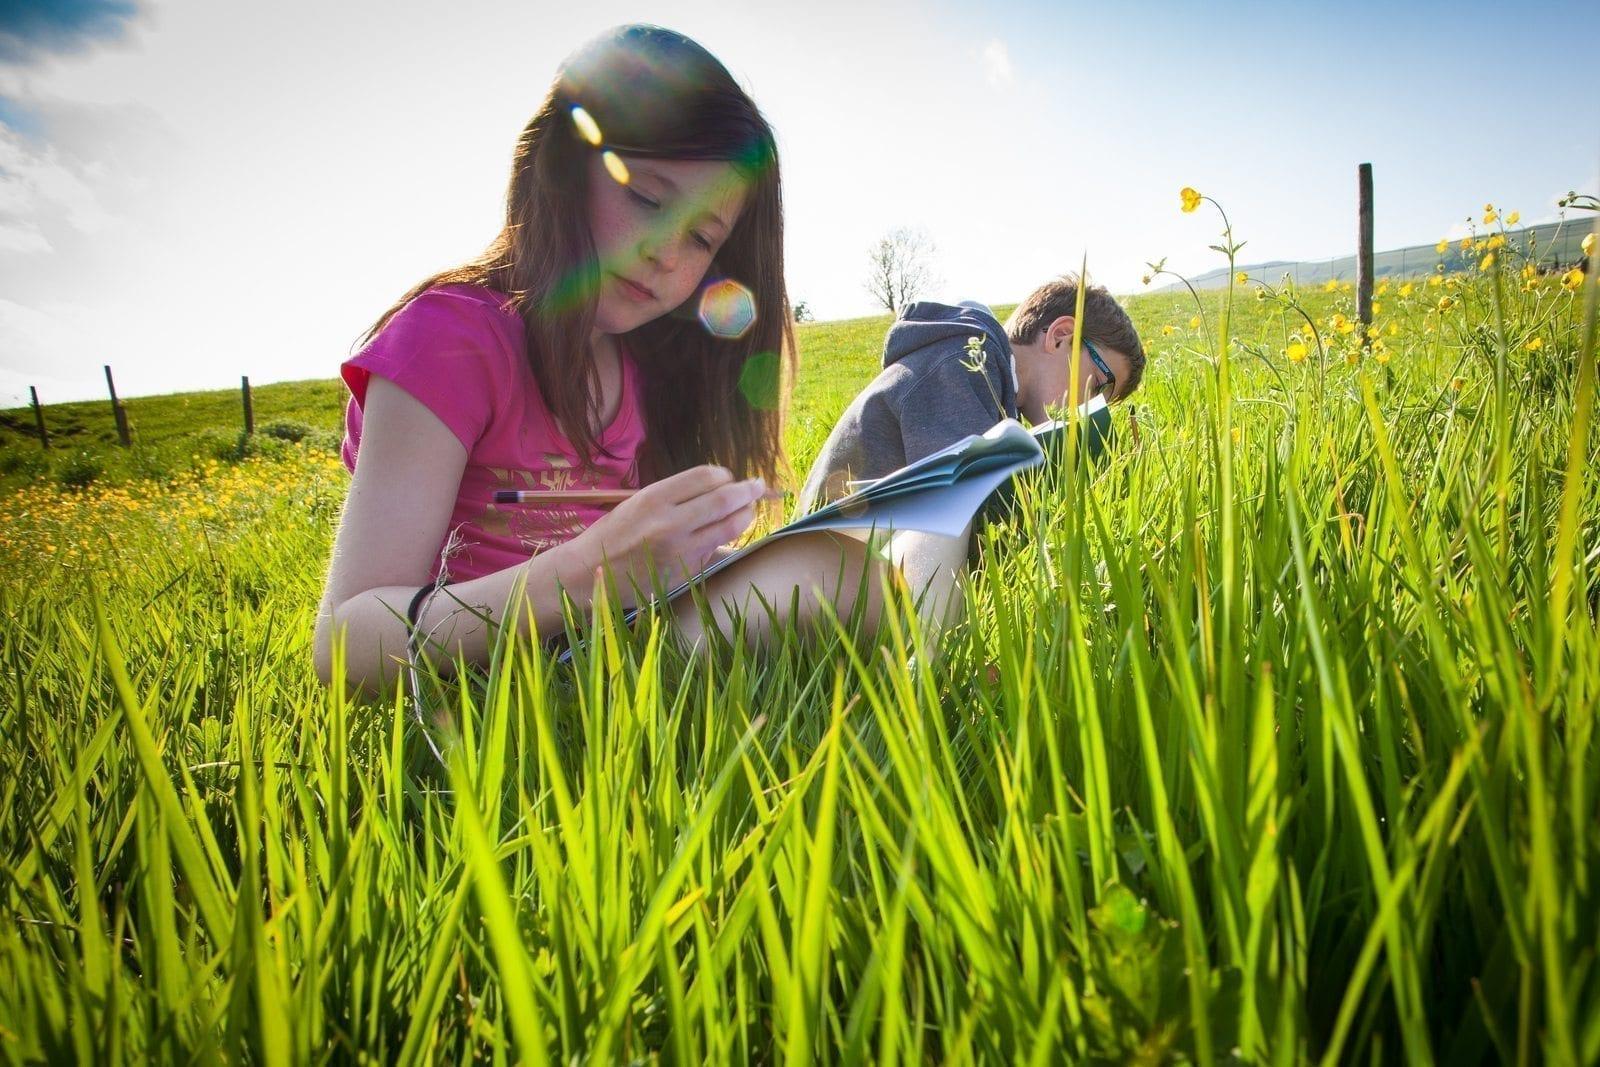 girl grass drawing microadventure